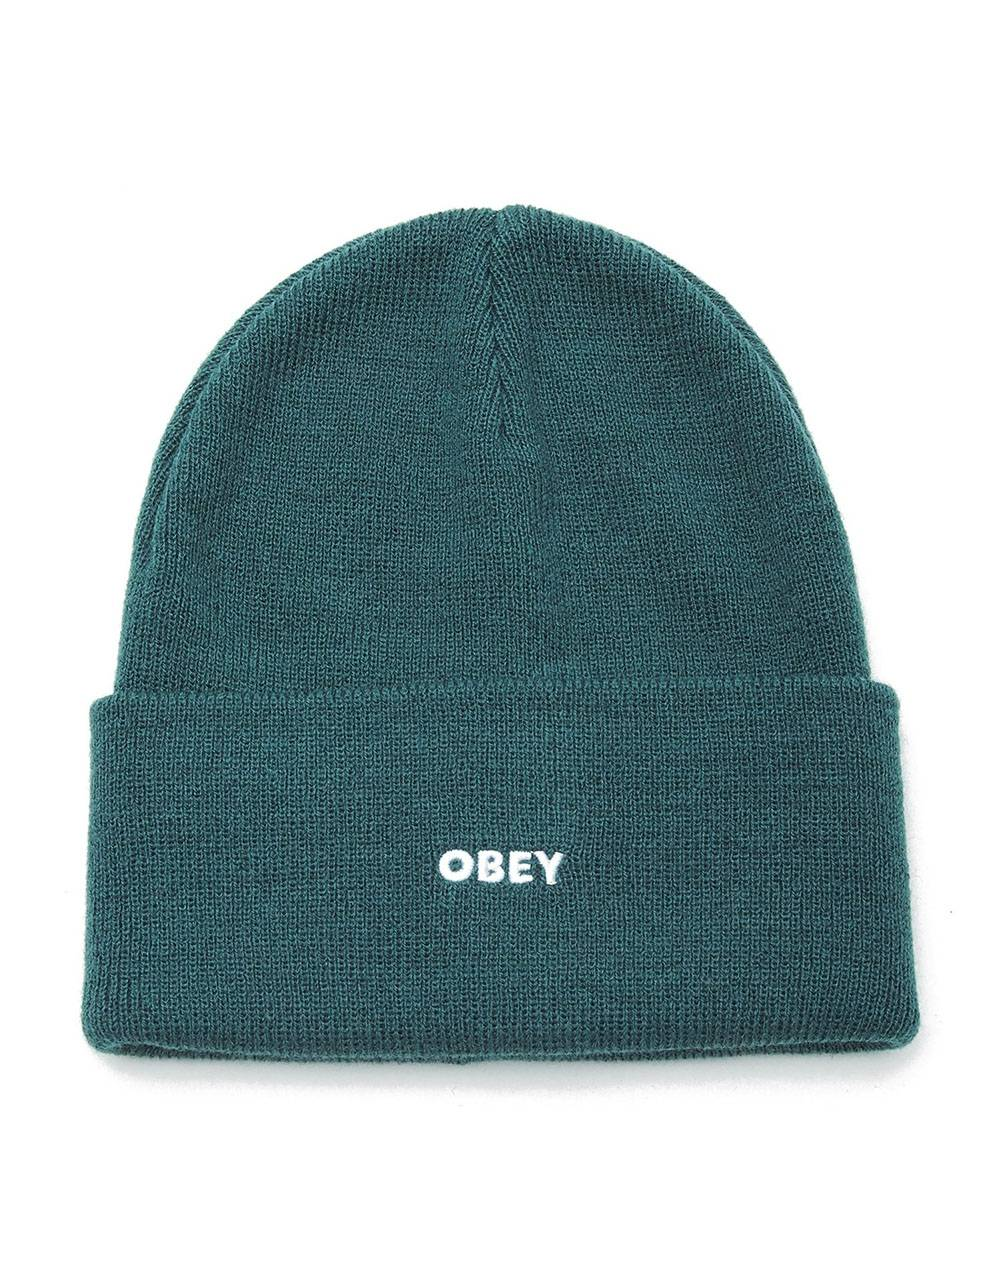 Obey fluid beanie - mallard green obey Beanie 28,69€